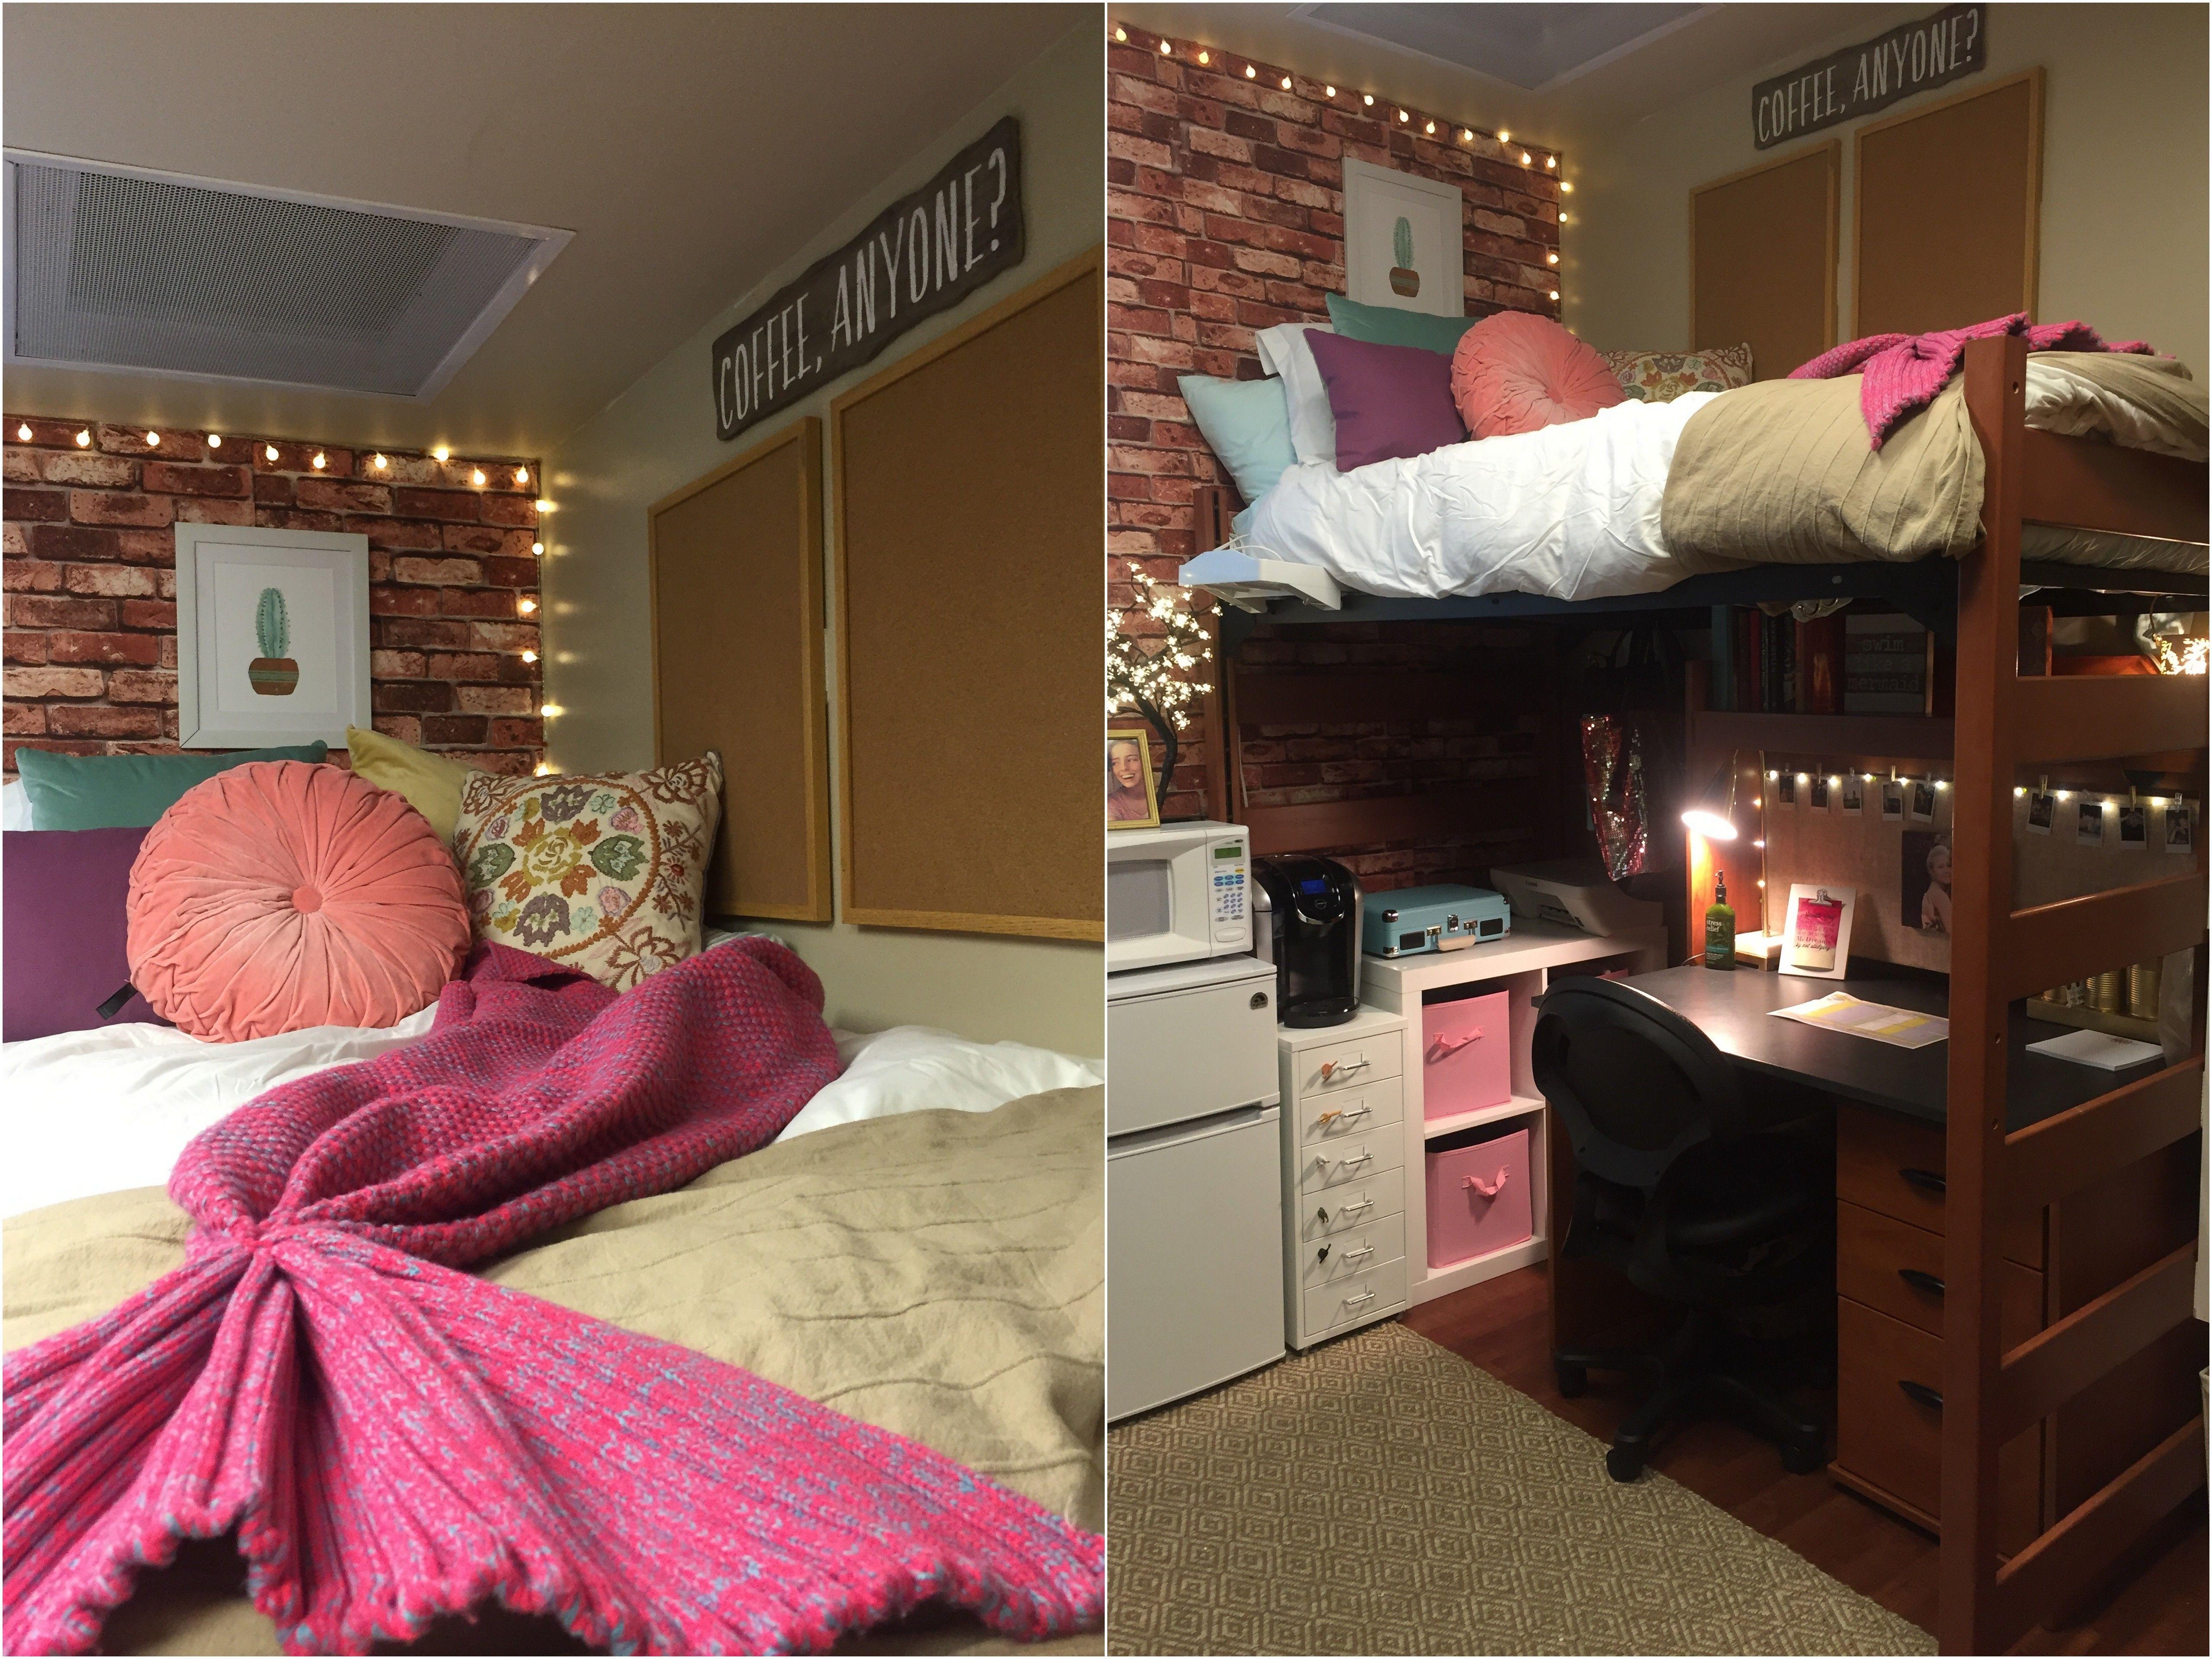 Creative dorm room ideas to make your space more cozy brick wallpaper - College dorm room ideas examples ...